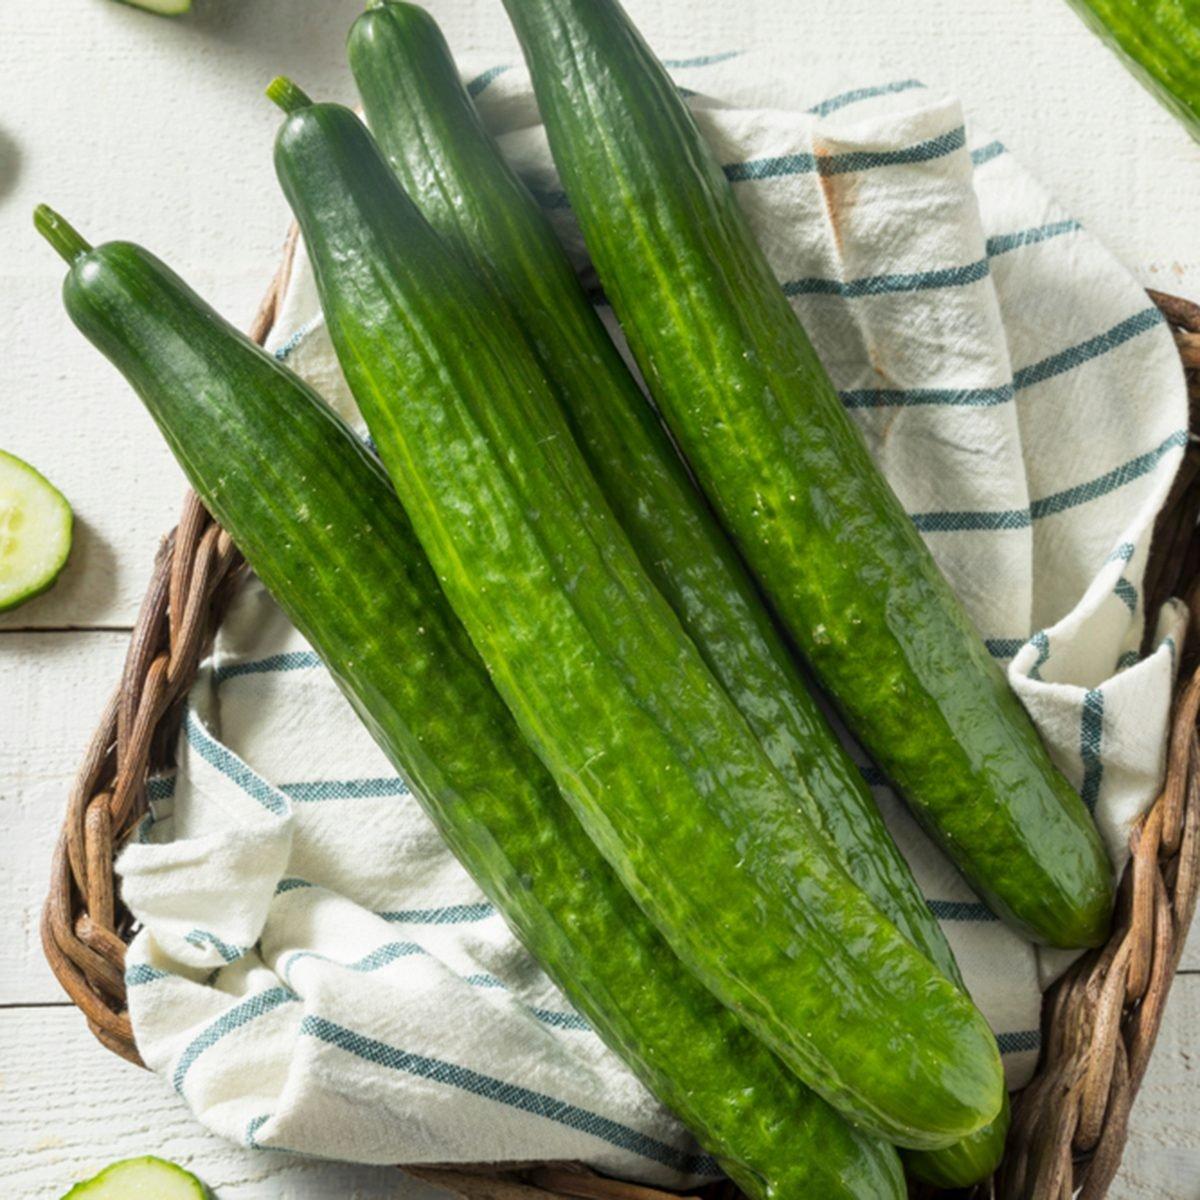 Healthy Organic Green English Cucumbers